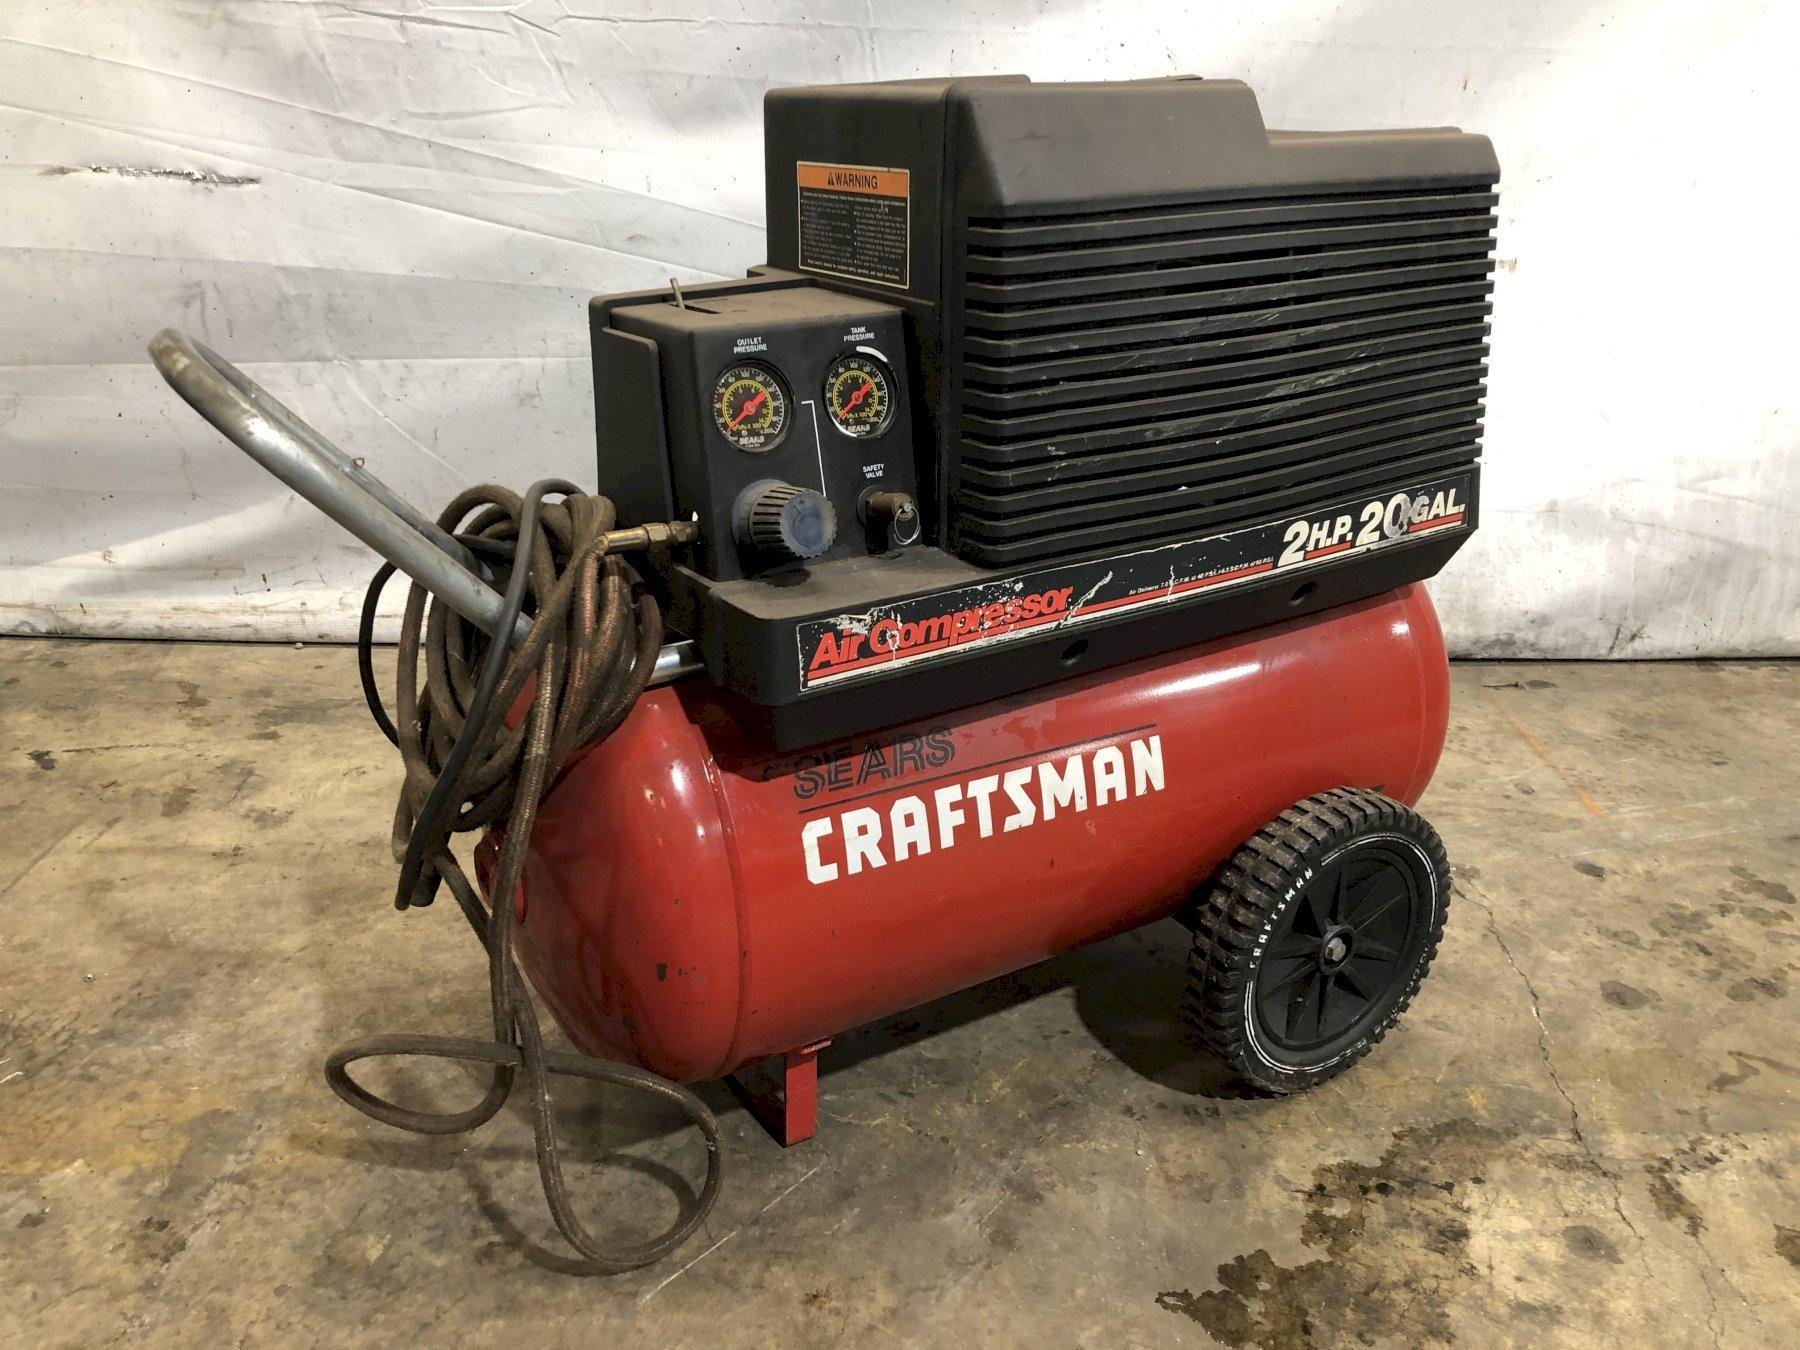 2 HP CRAFTSMAN PORTABLE AIR COMPRESSOR: STOCK #10969